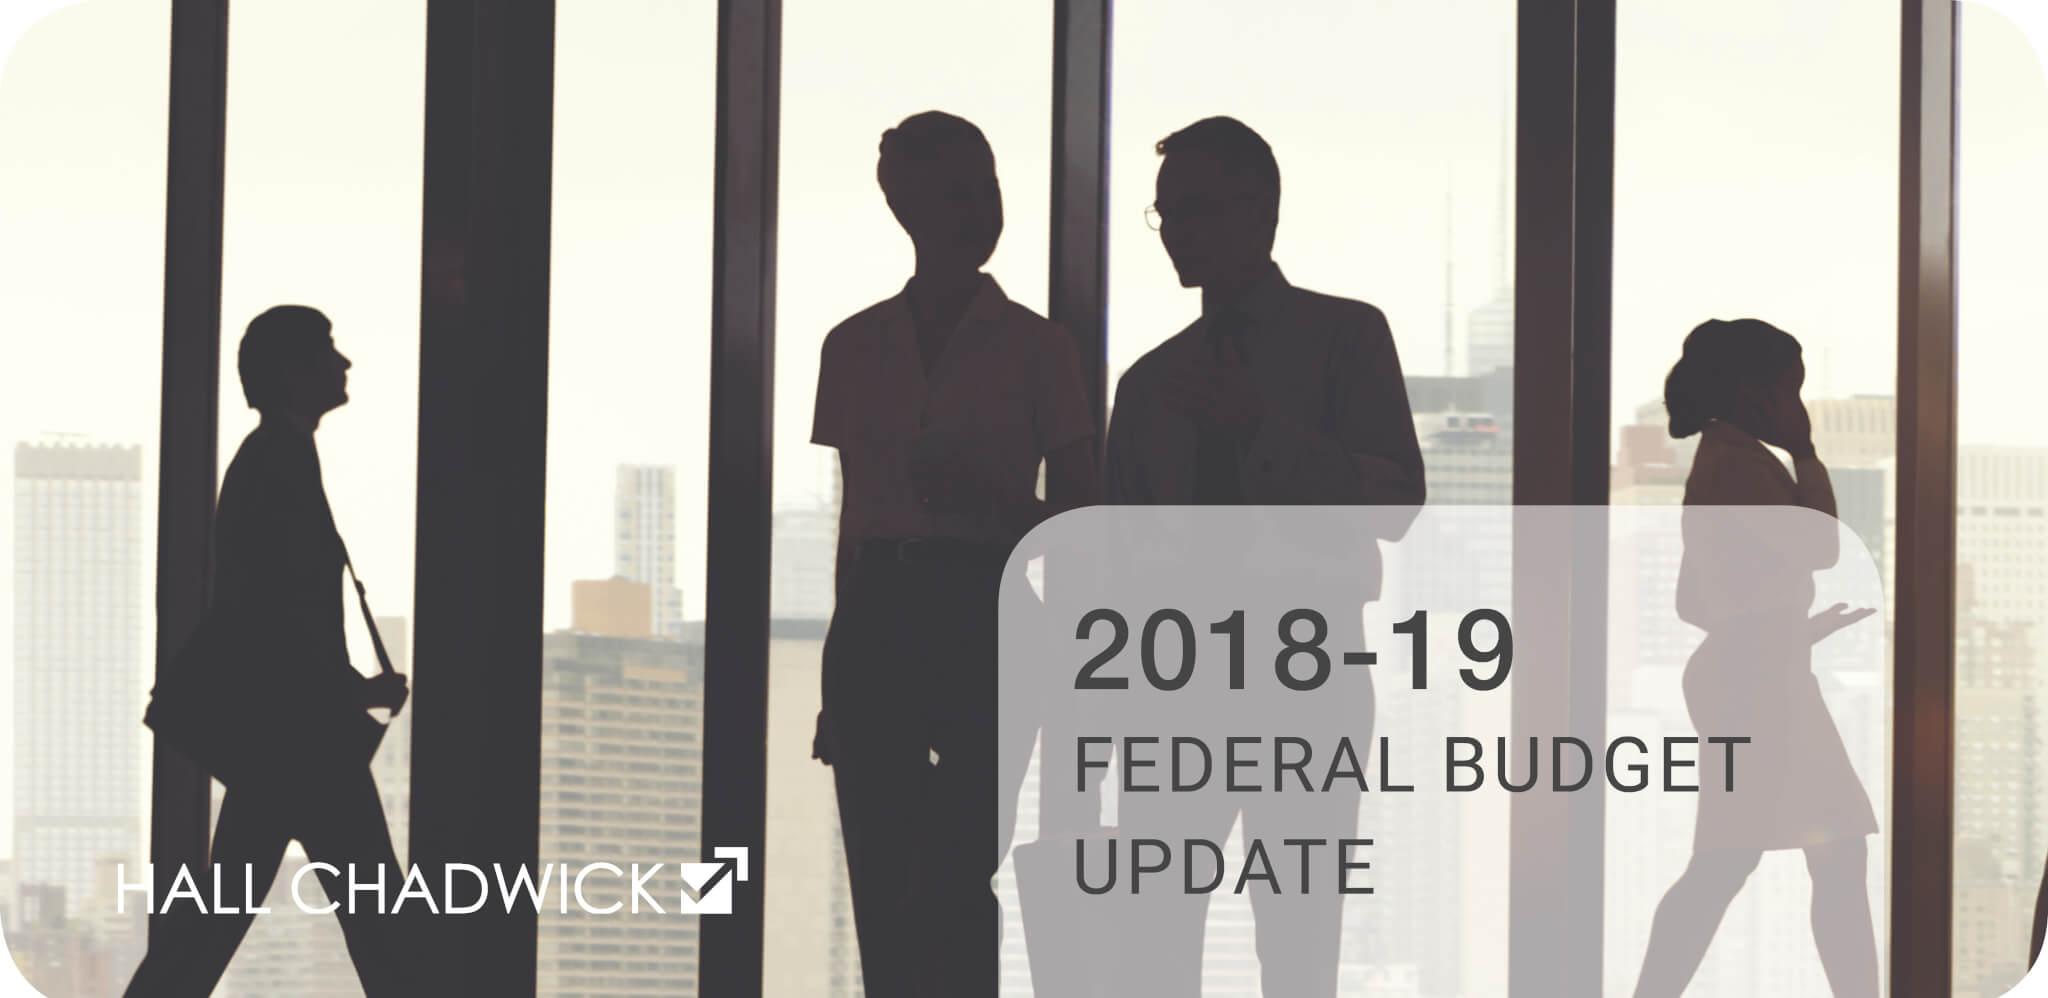 2018-19 Federal Budget Update